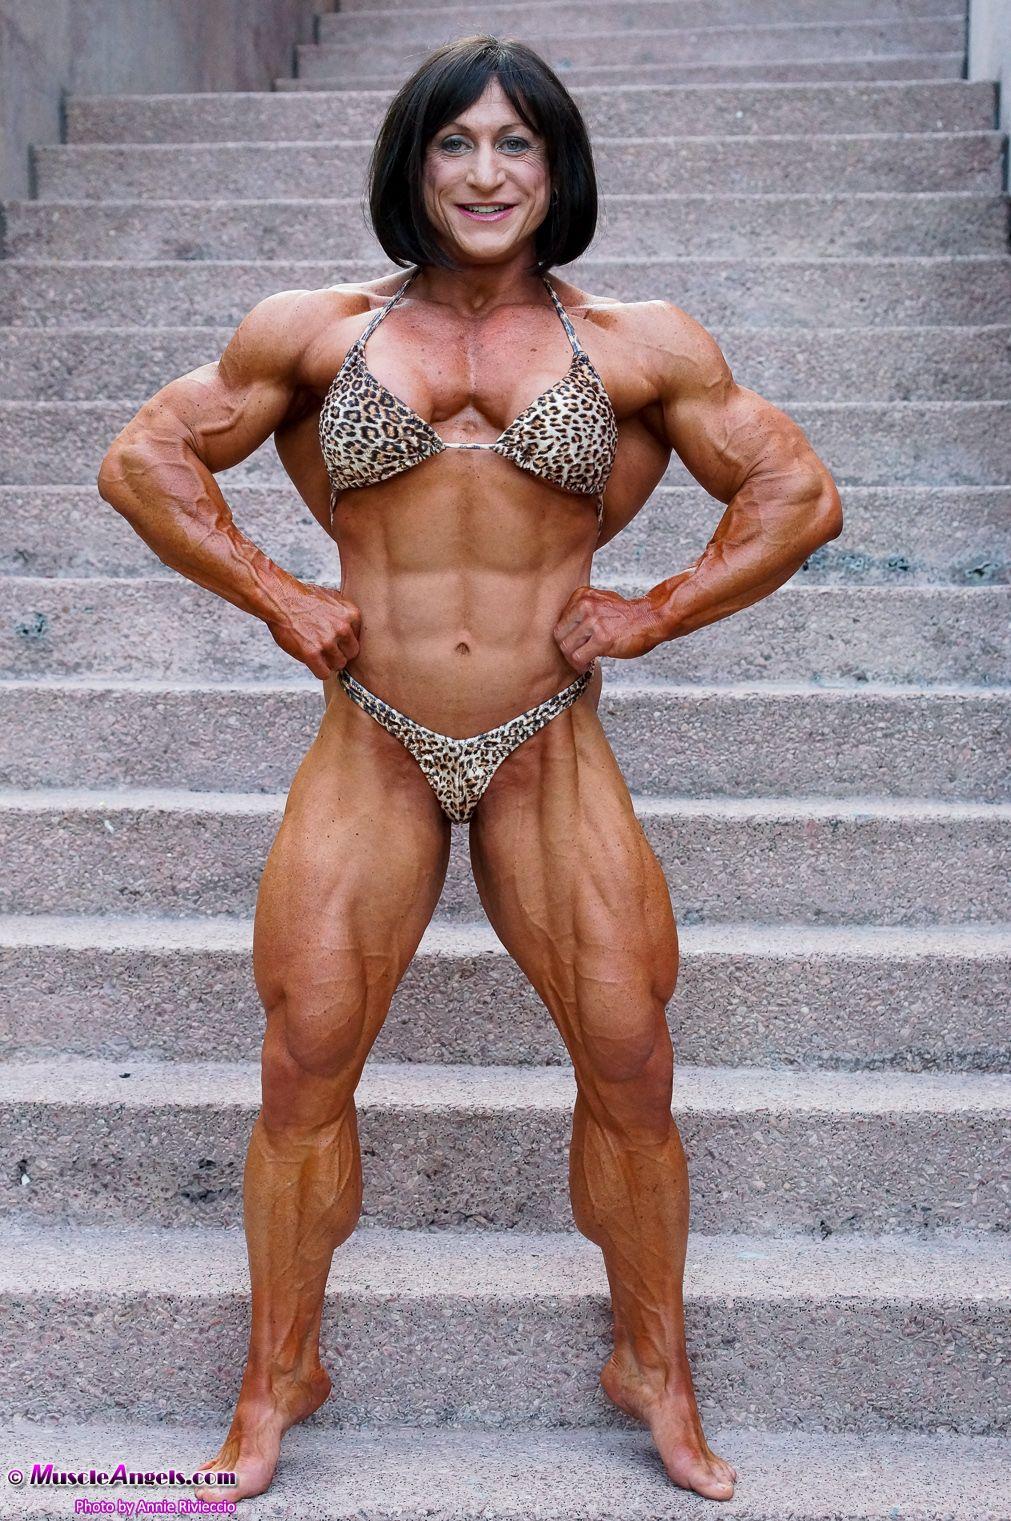 CHRISTINE ENVALL | Fitness | Pinterest | Muscles, Female